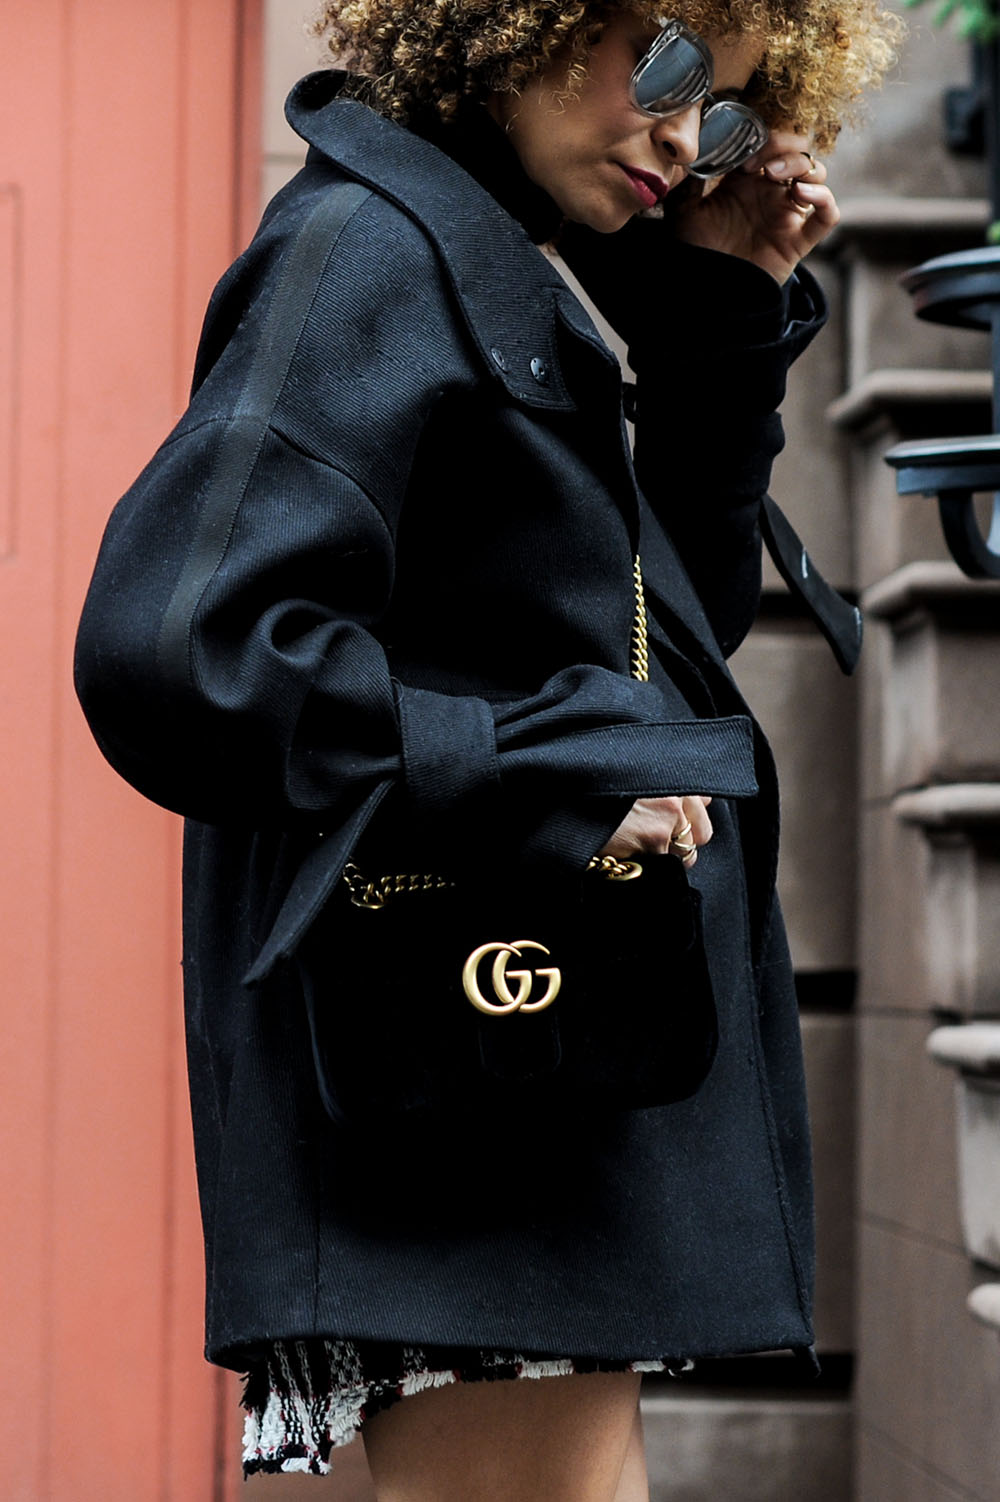 8bdbcb53d87 Street-style-blogger-Sai-De-Silva-wearing-Checkered-dress-with-Gucci-purse -and-Gucci-Boots-8